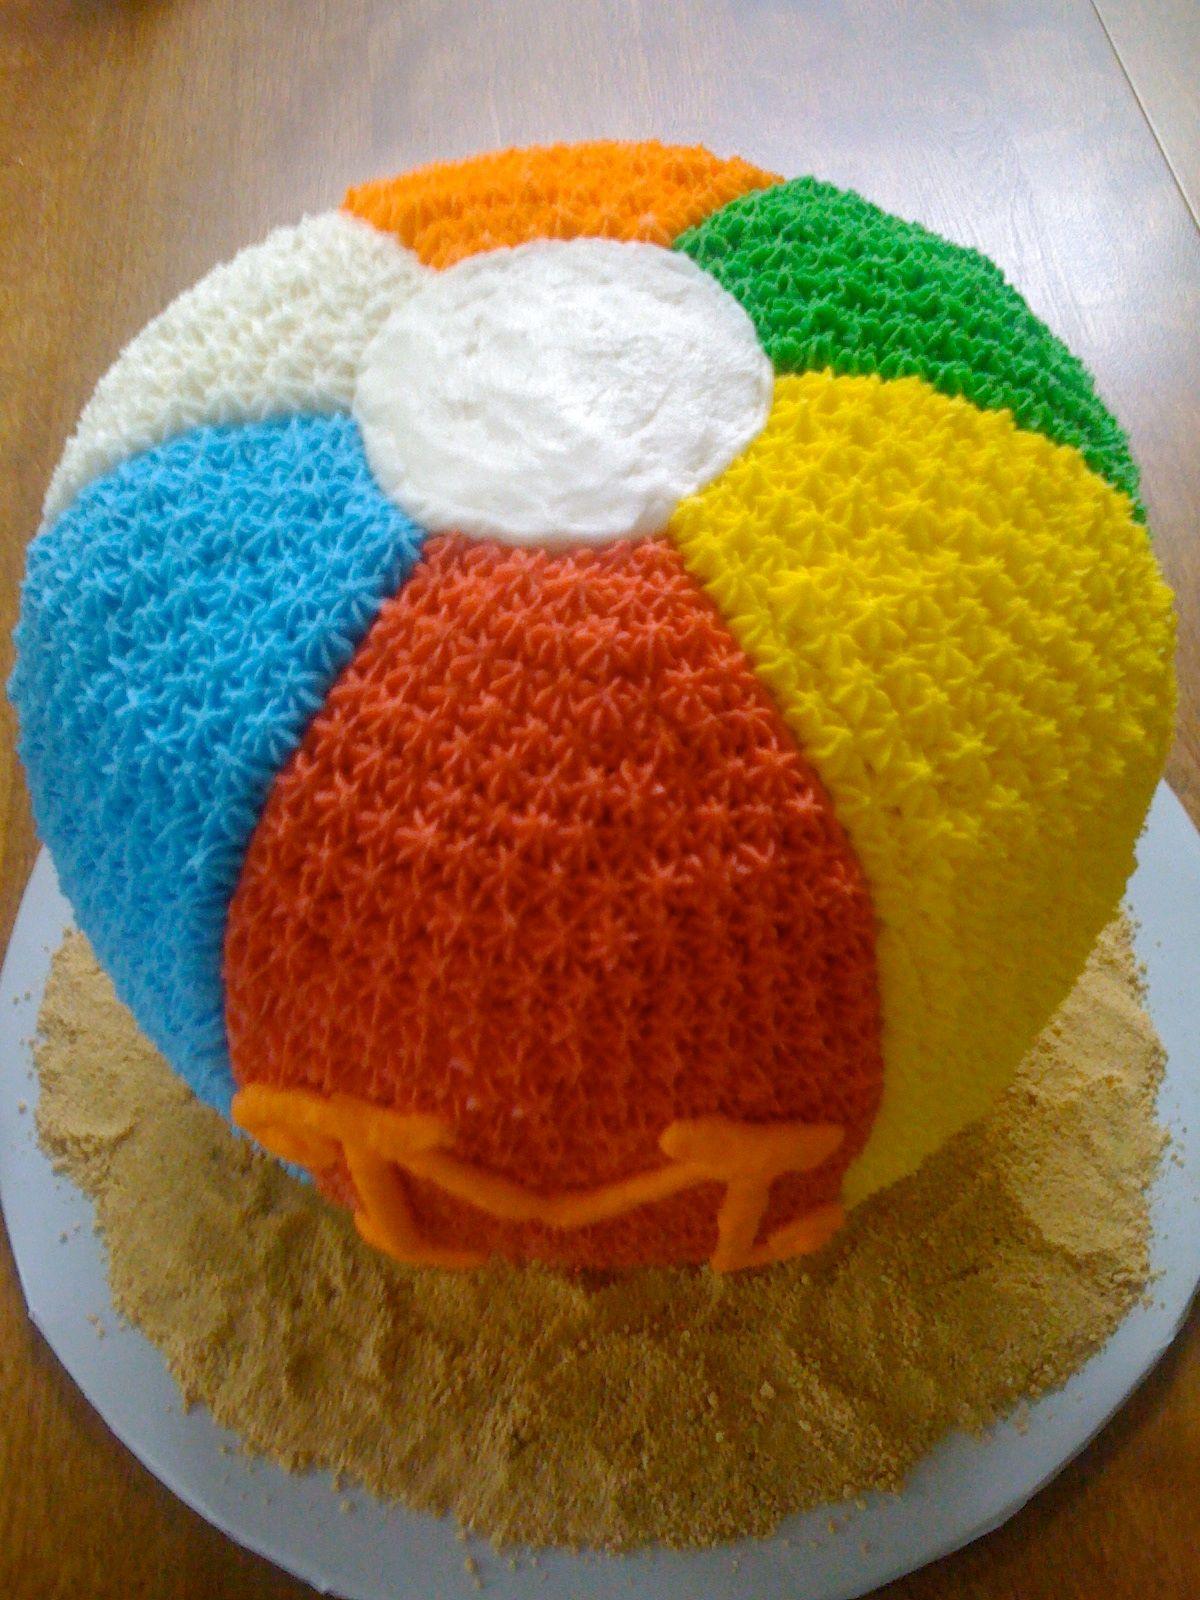 Beach ball cake | Beach ball cake, Pool birthday party ...